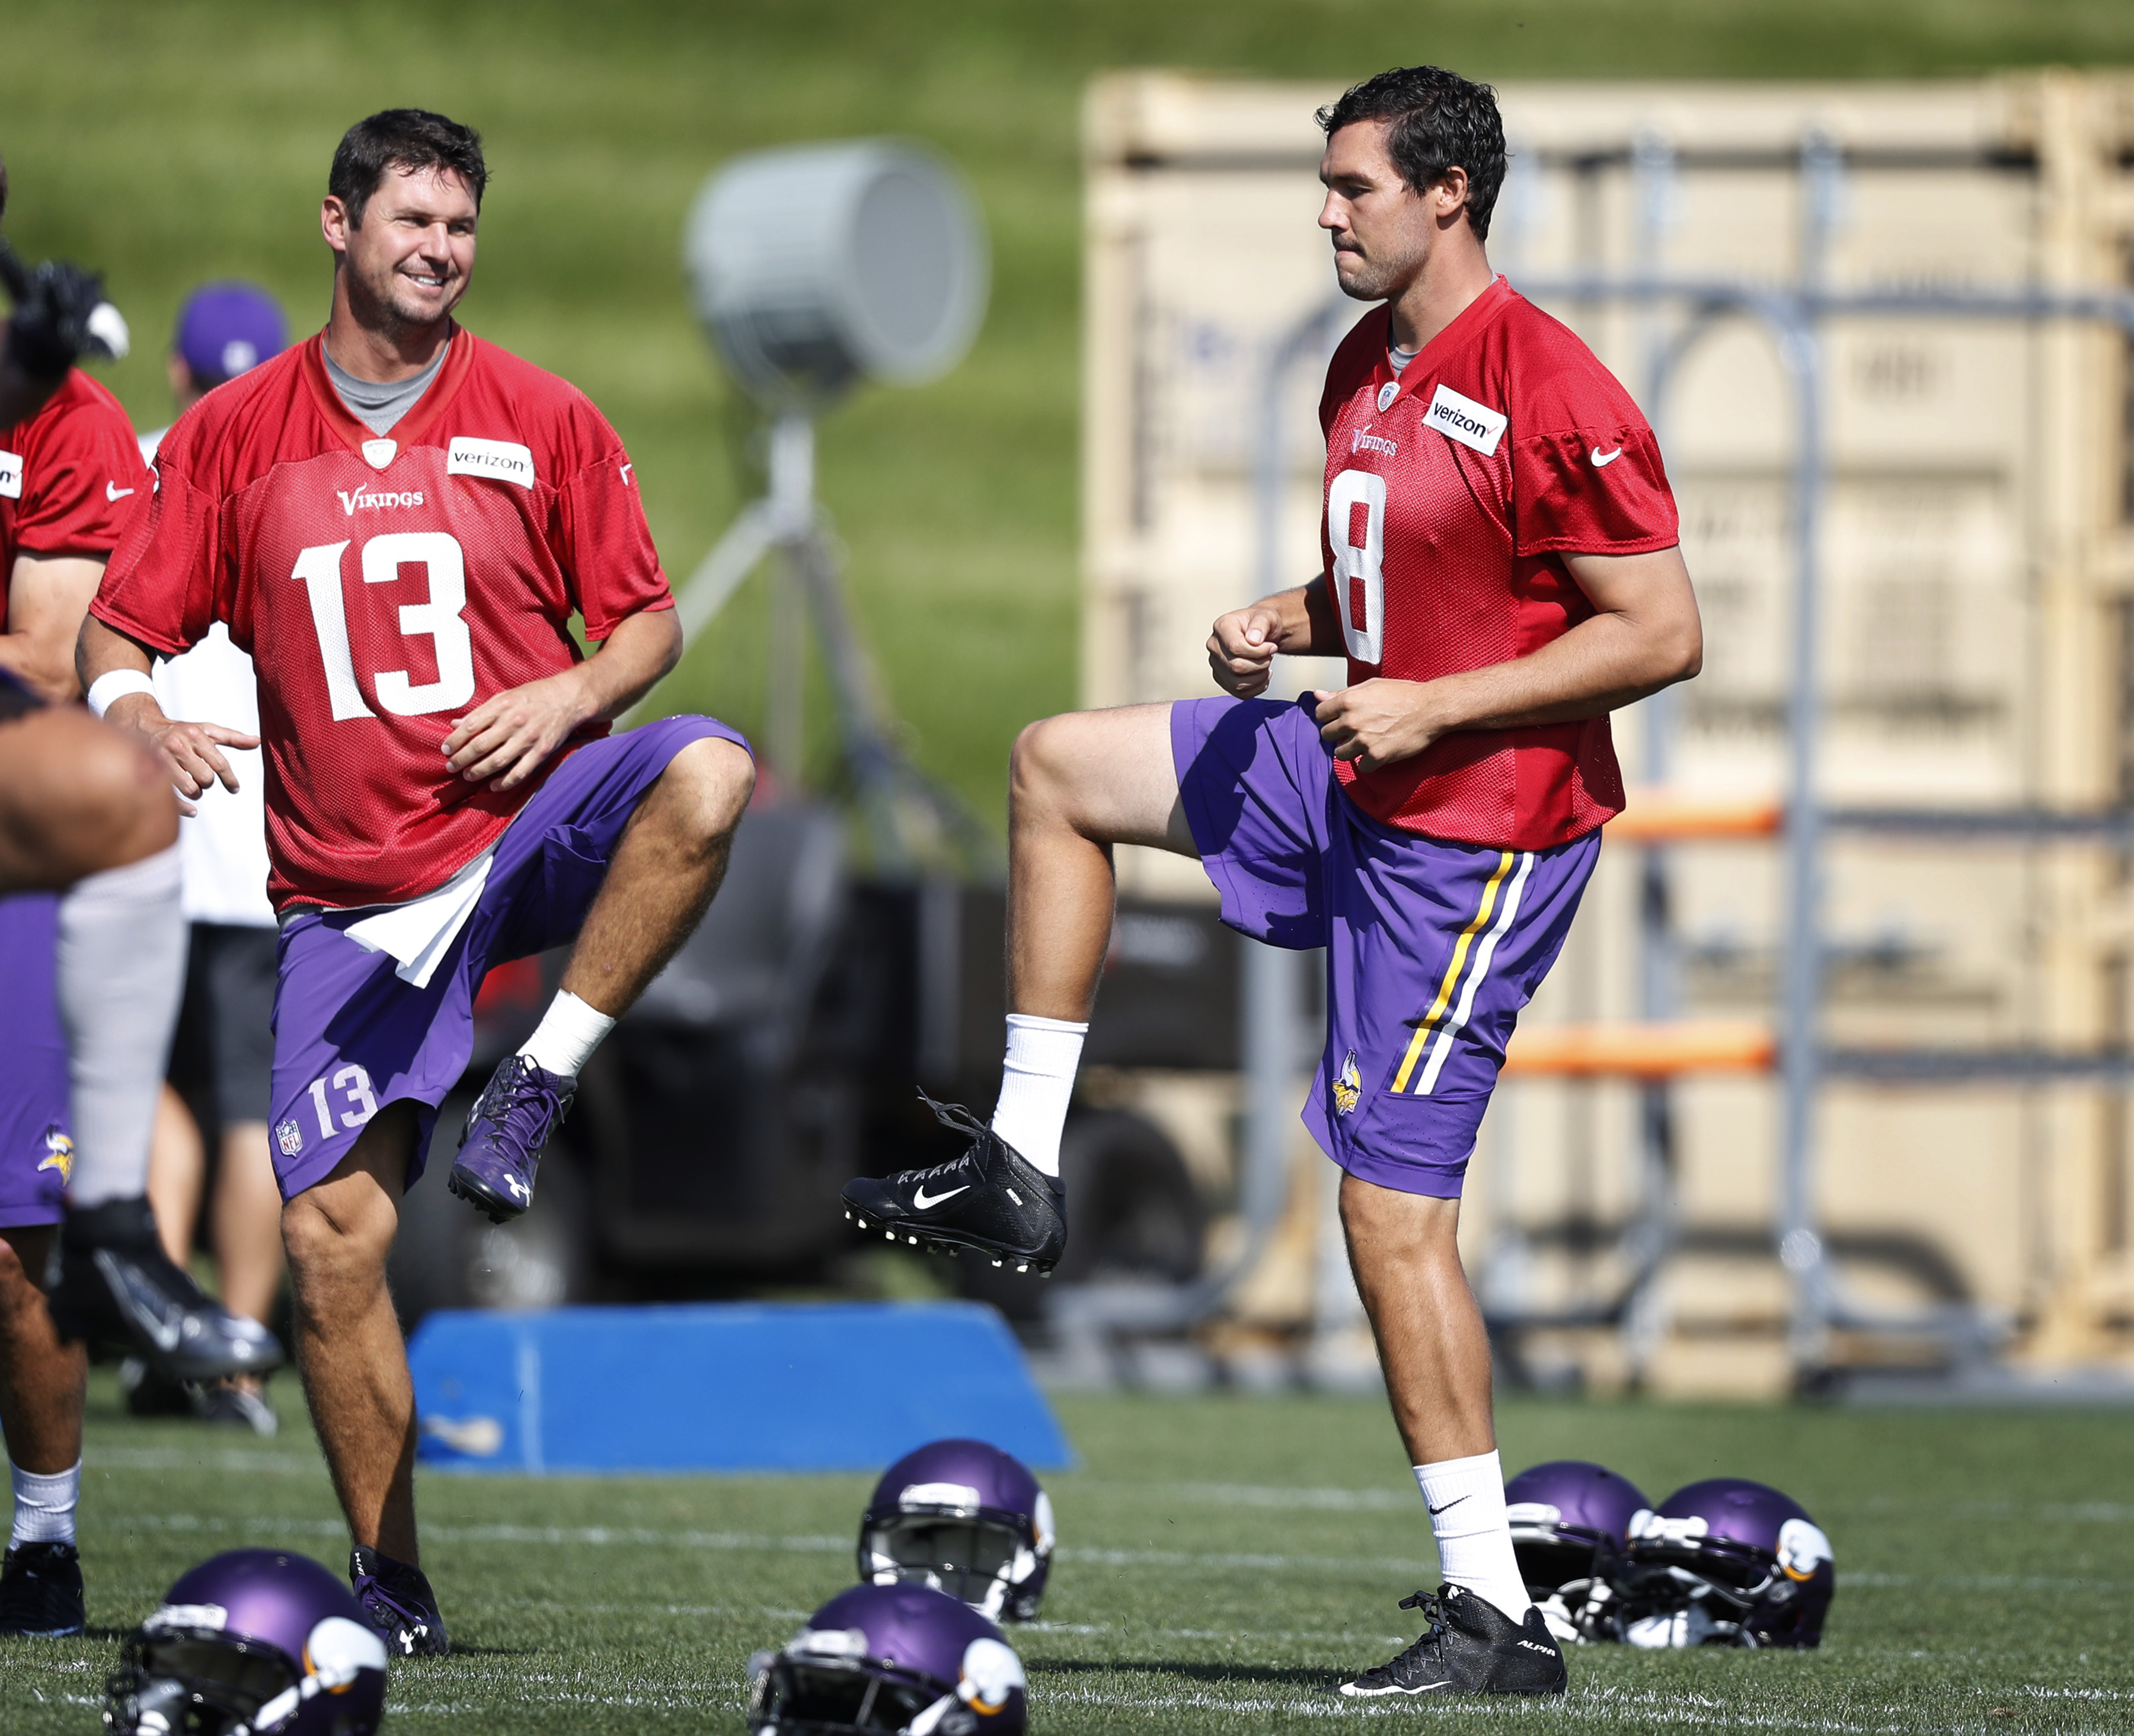 Minnesota Vikings quarterbacks Shaun Hill, left, and Sam Bradford warm up during practice Monday Sept. 5, 2016, in Eden Prairie, Minn. The Philadelphia Eagles traded Bradford to the Vikings on Saturday, for a pair of draft picks. (Jerry Holt/Star Tribune